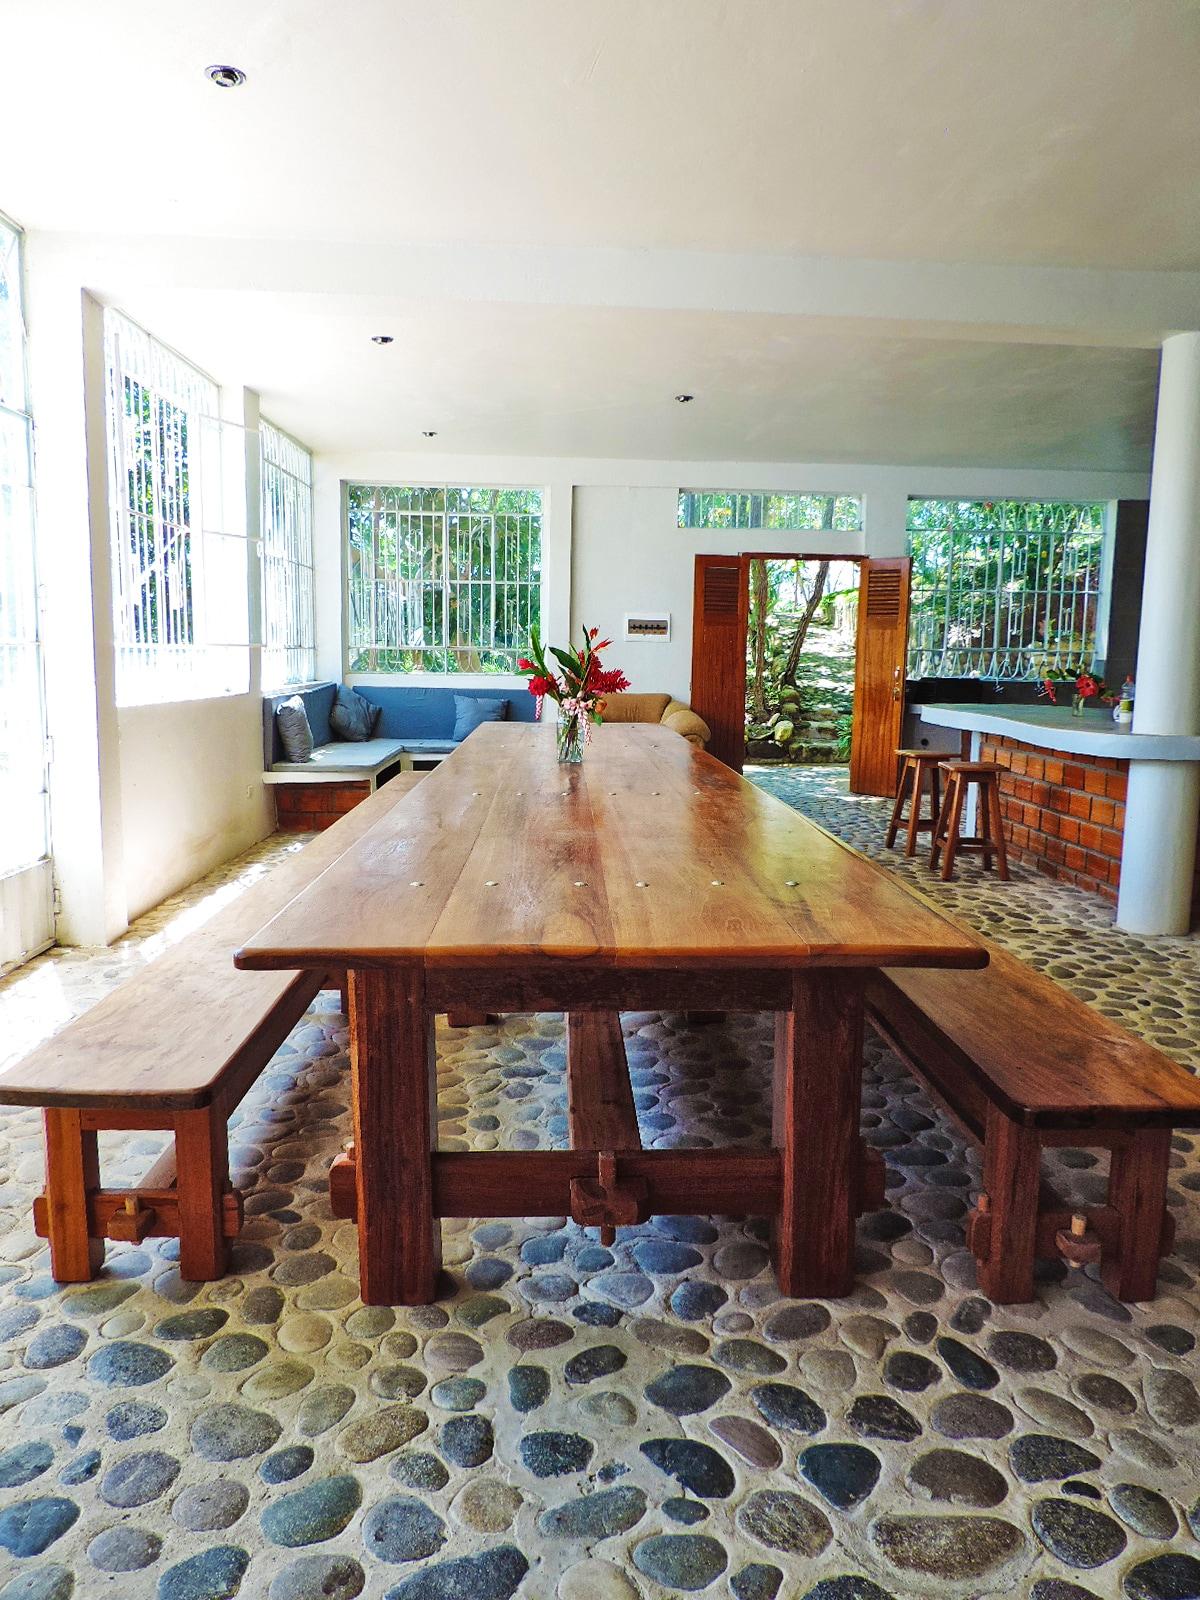 Rustic Luxury B&B in upper Amazonia